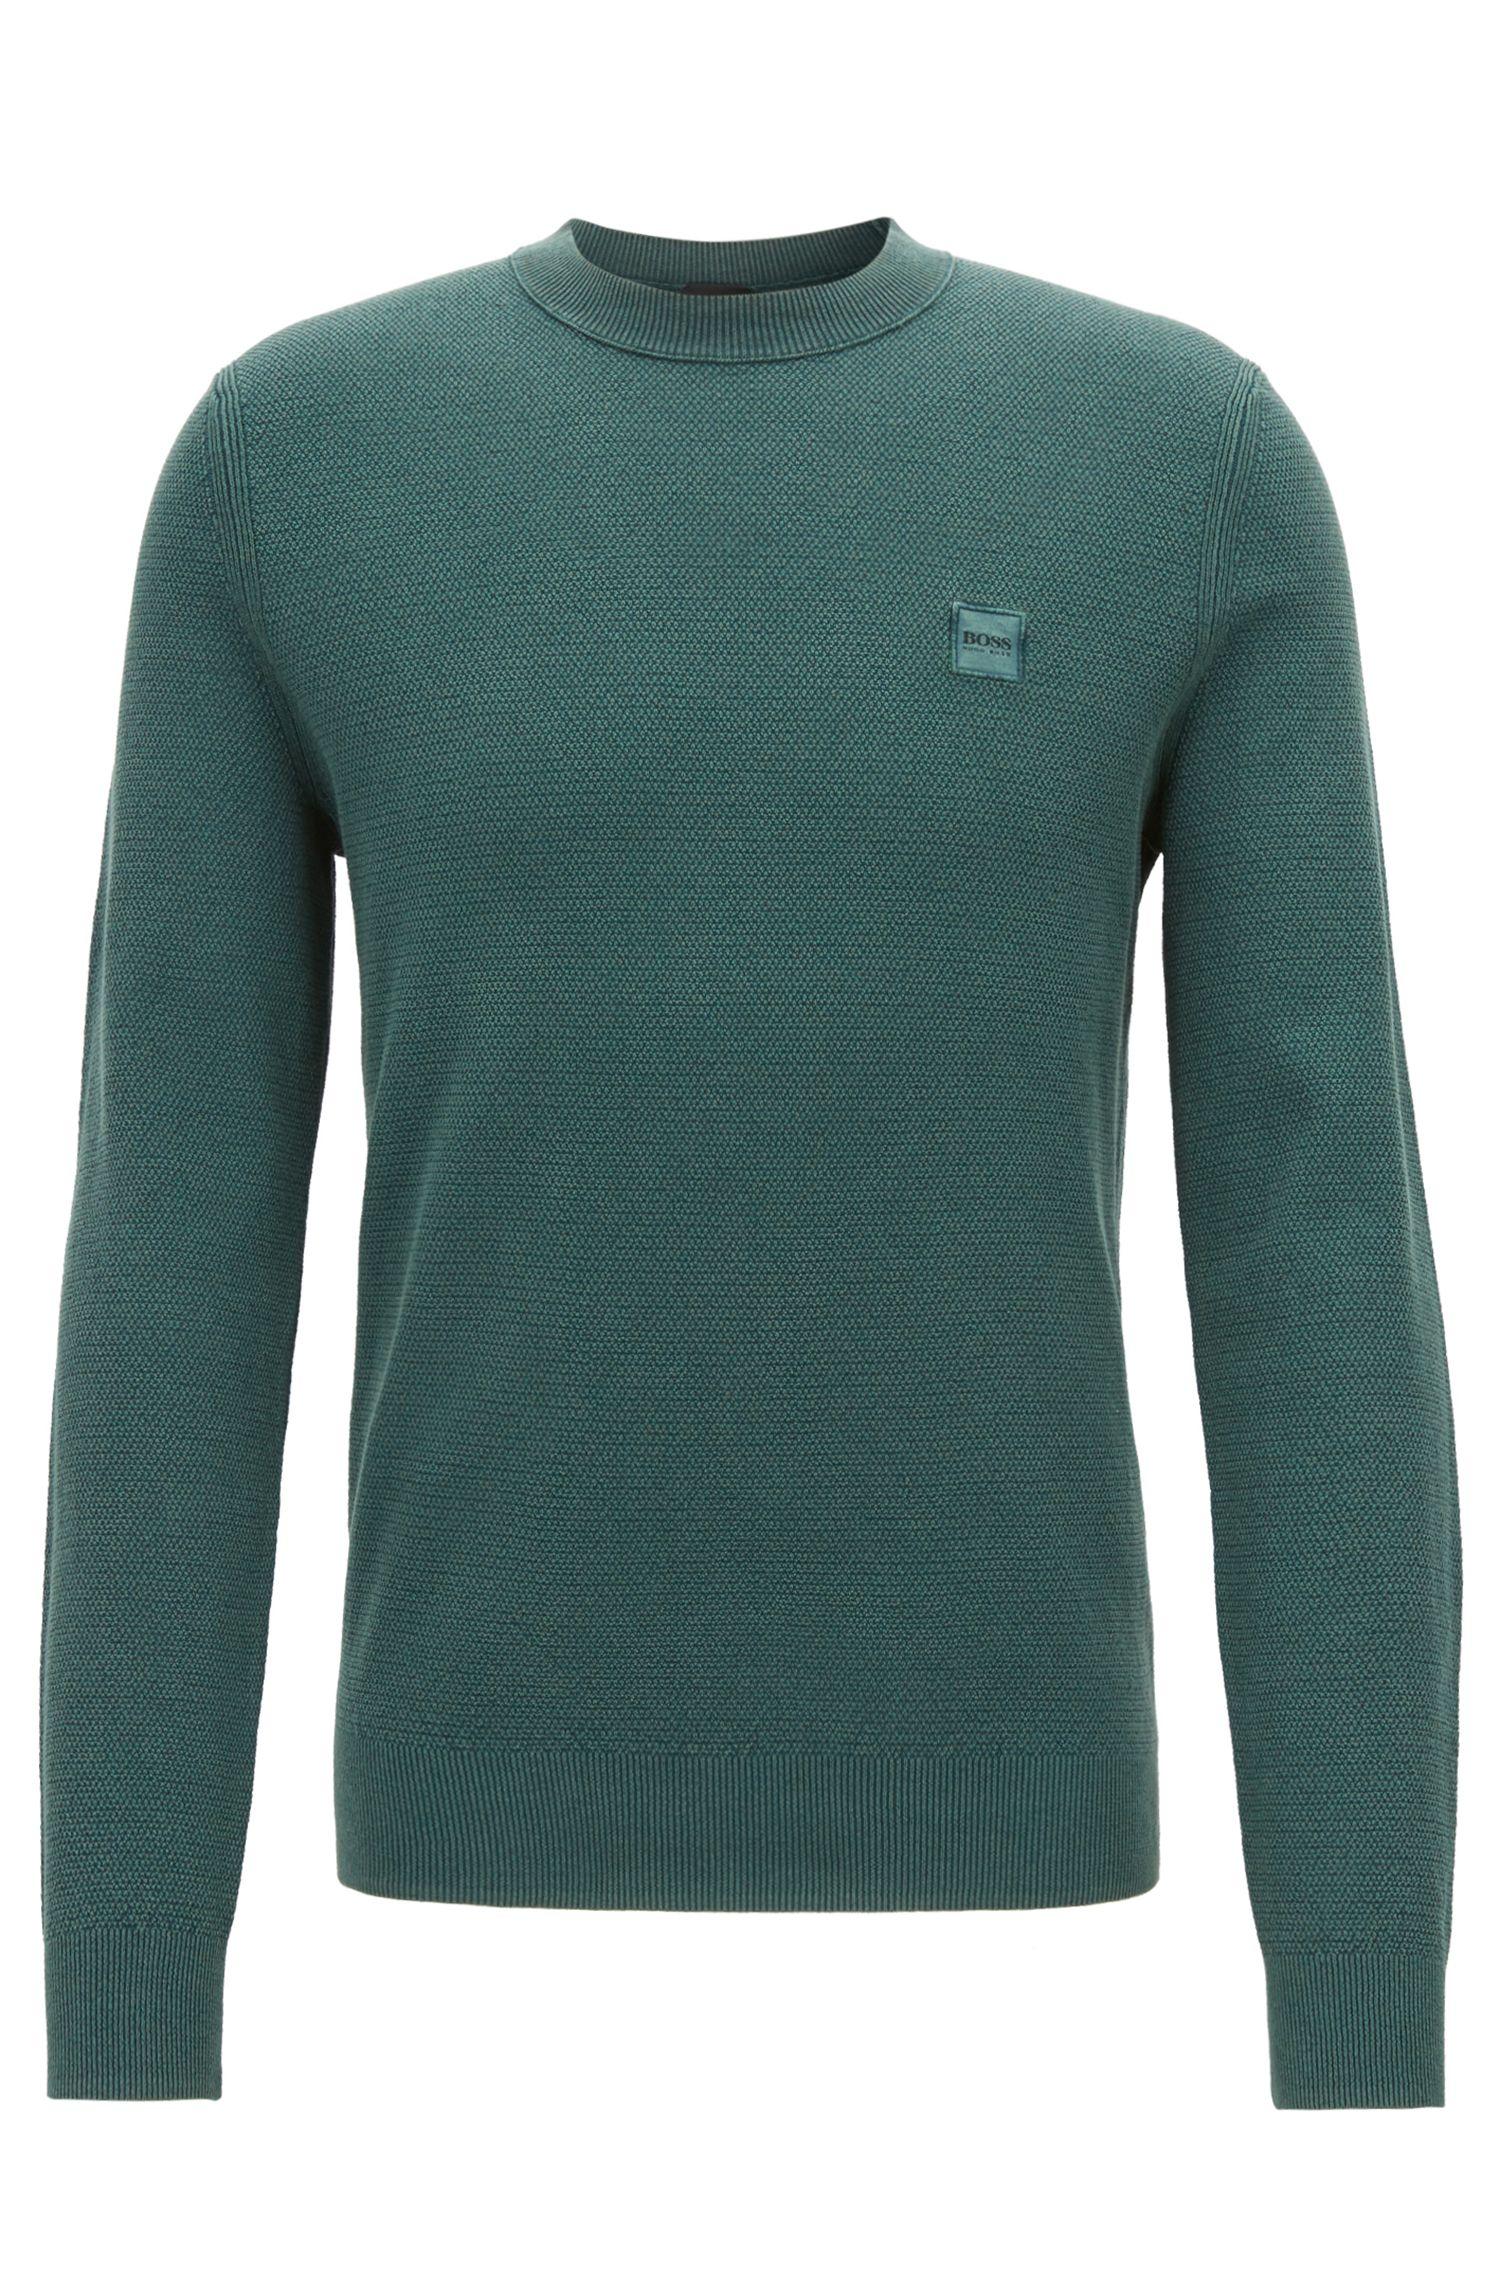 Jersey de cuello redondo en algodón con textura, Verde oscuro